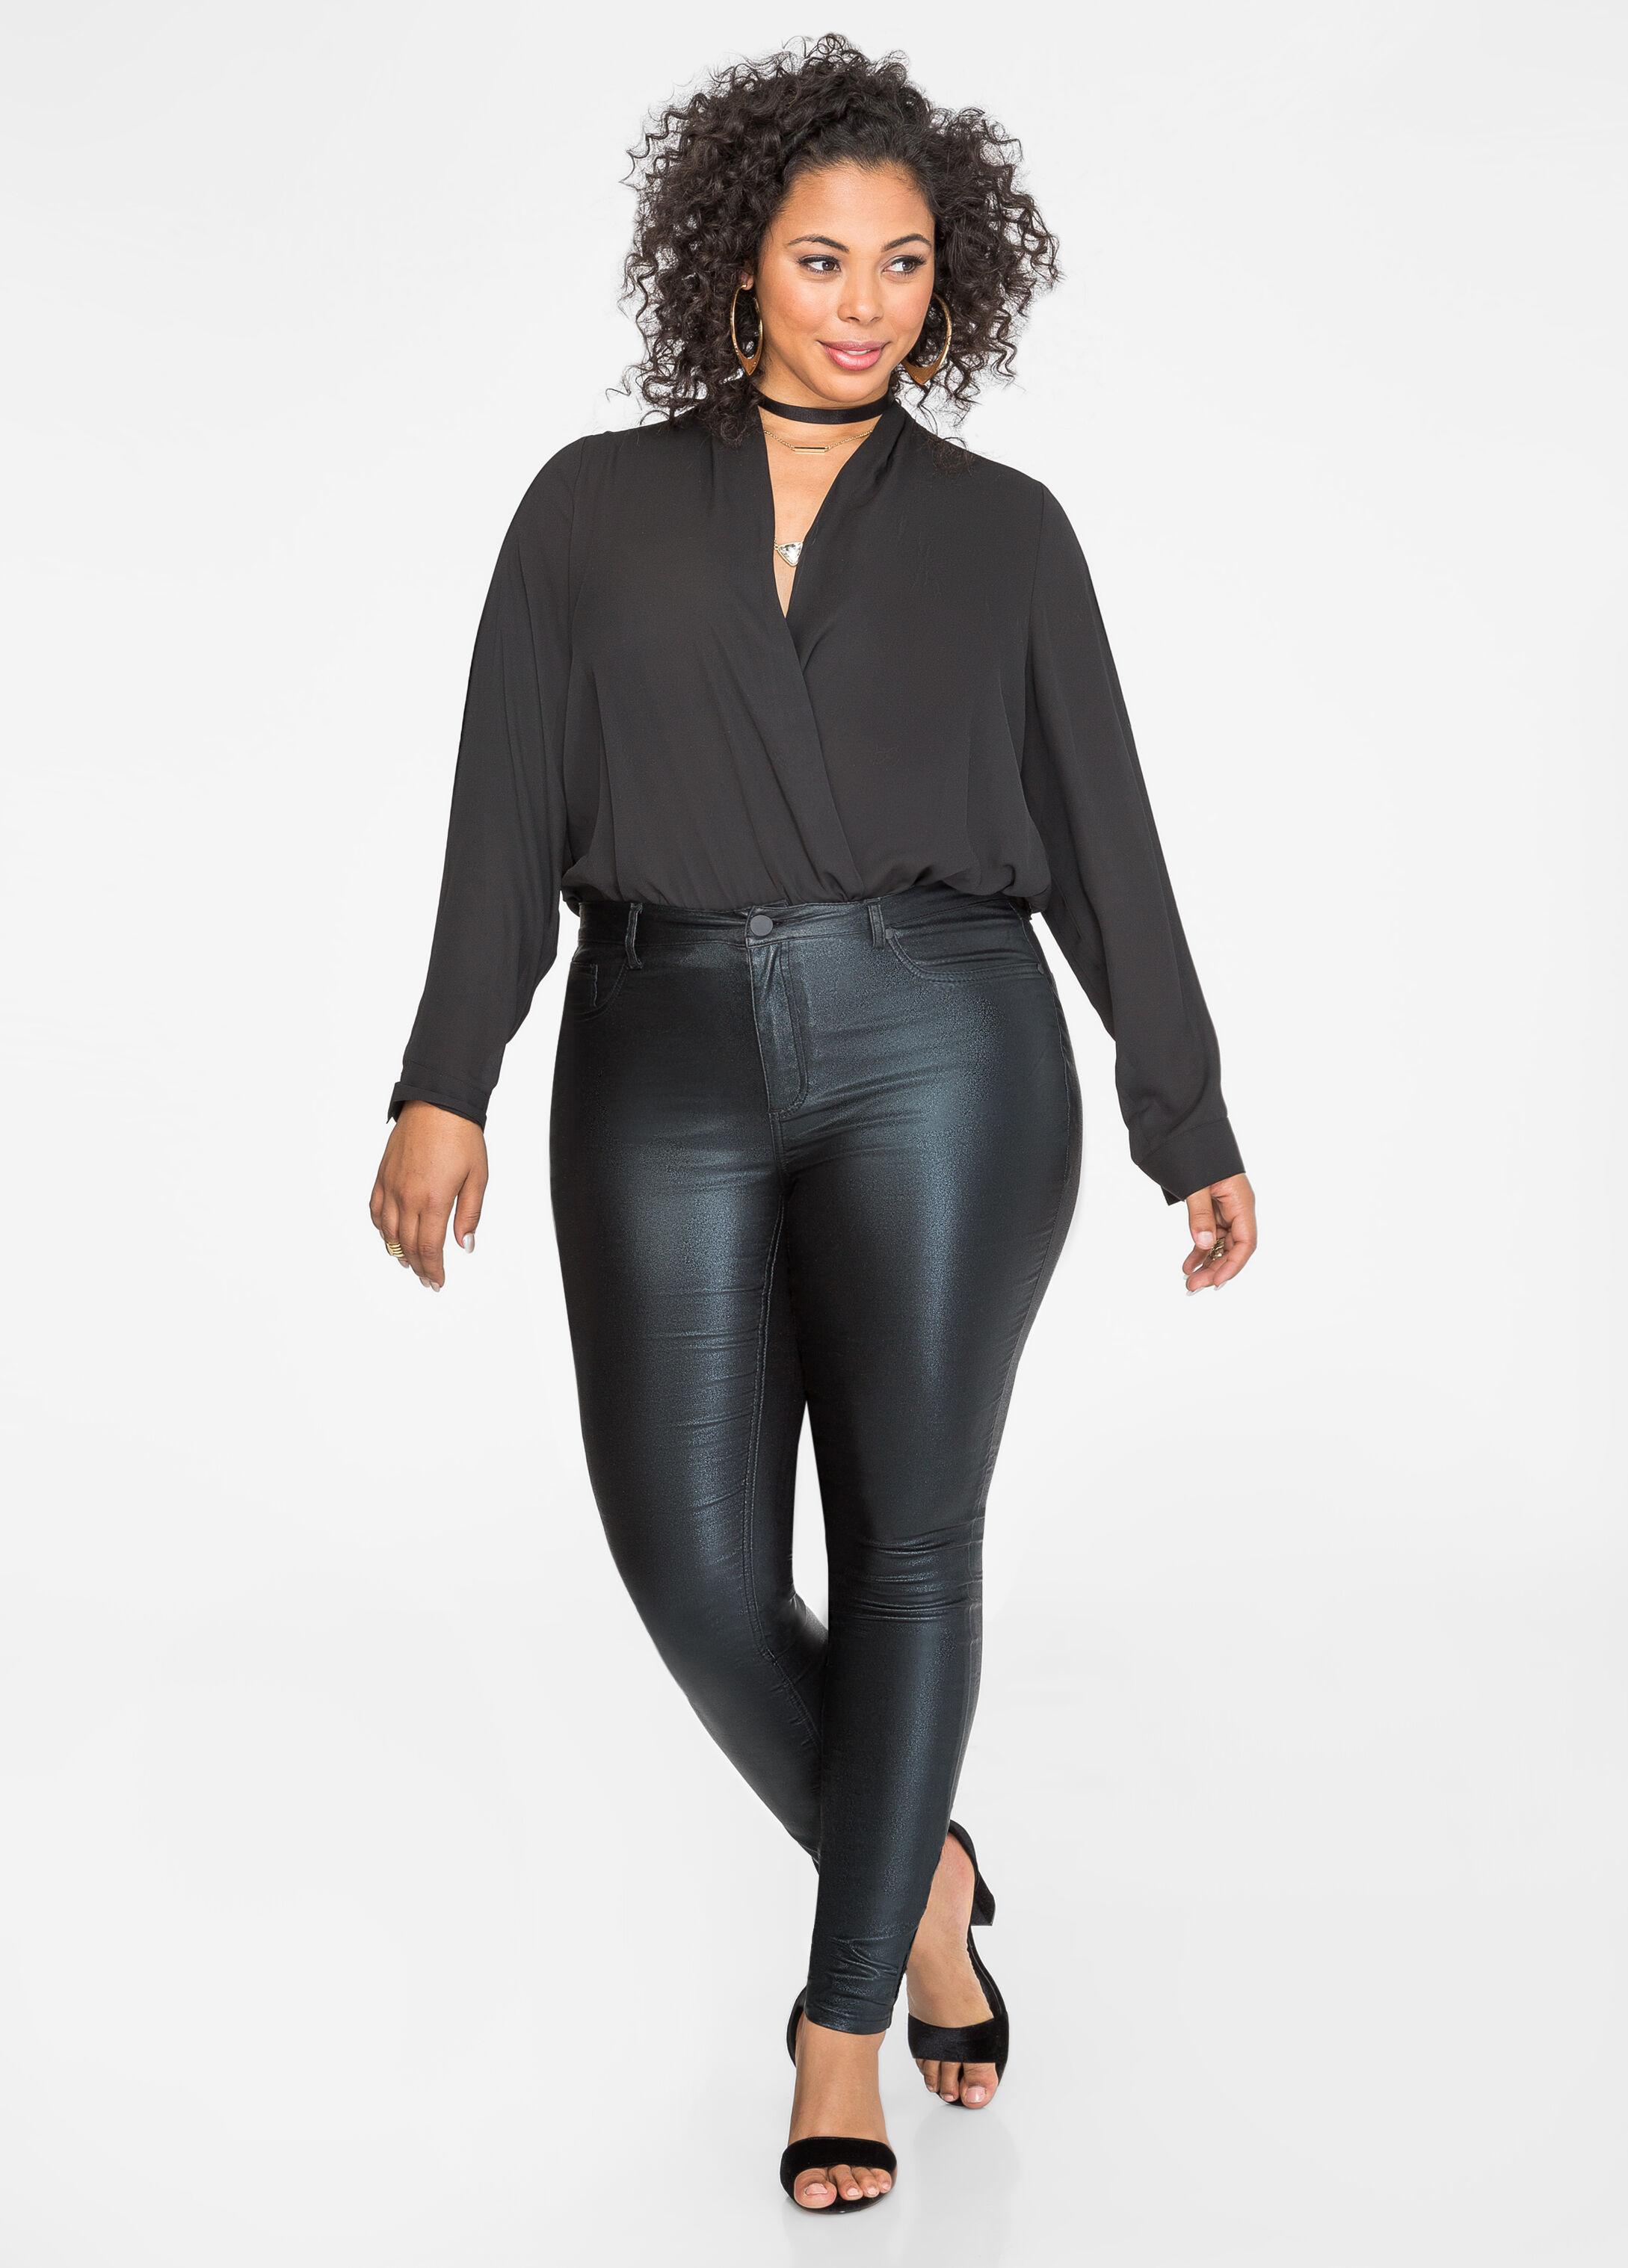 surplice blouse bodysuit-plus size tops-ashley stewart-035-l9m5635